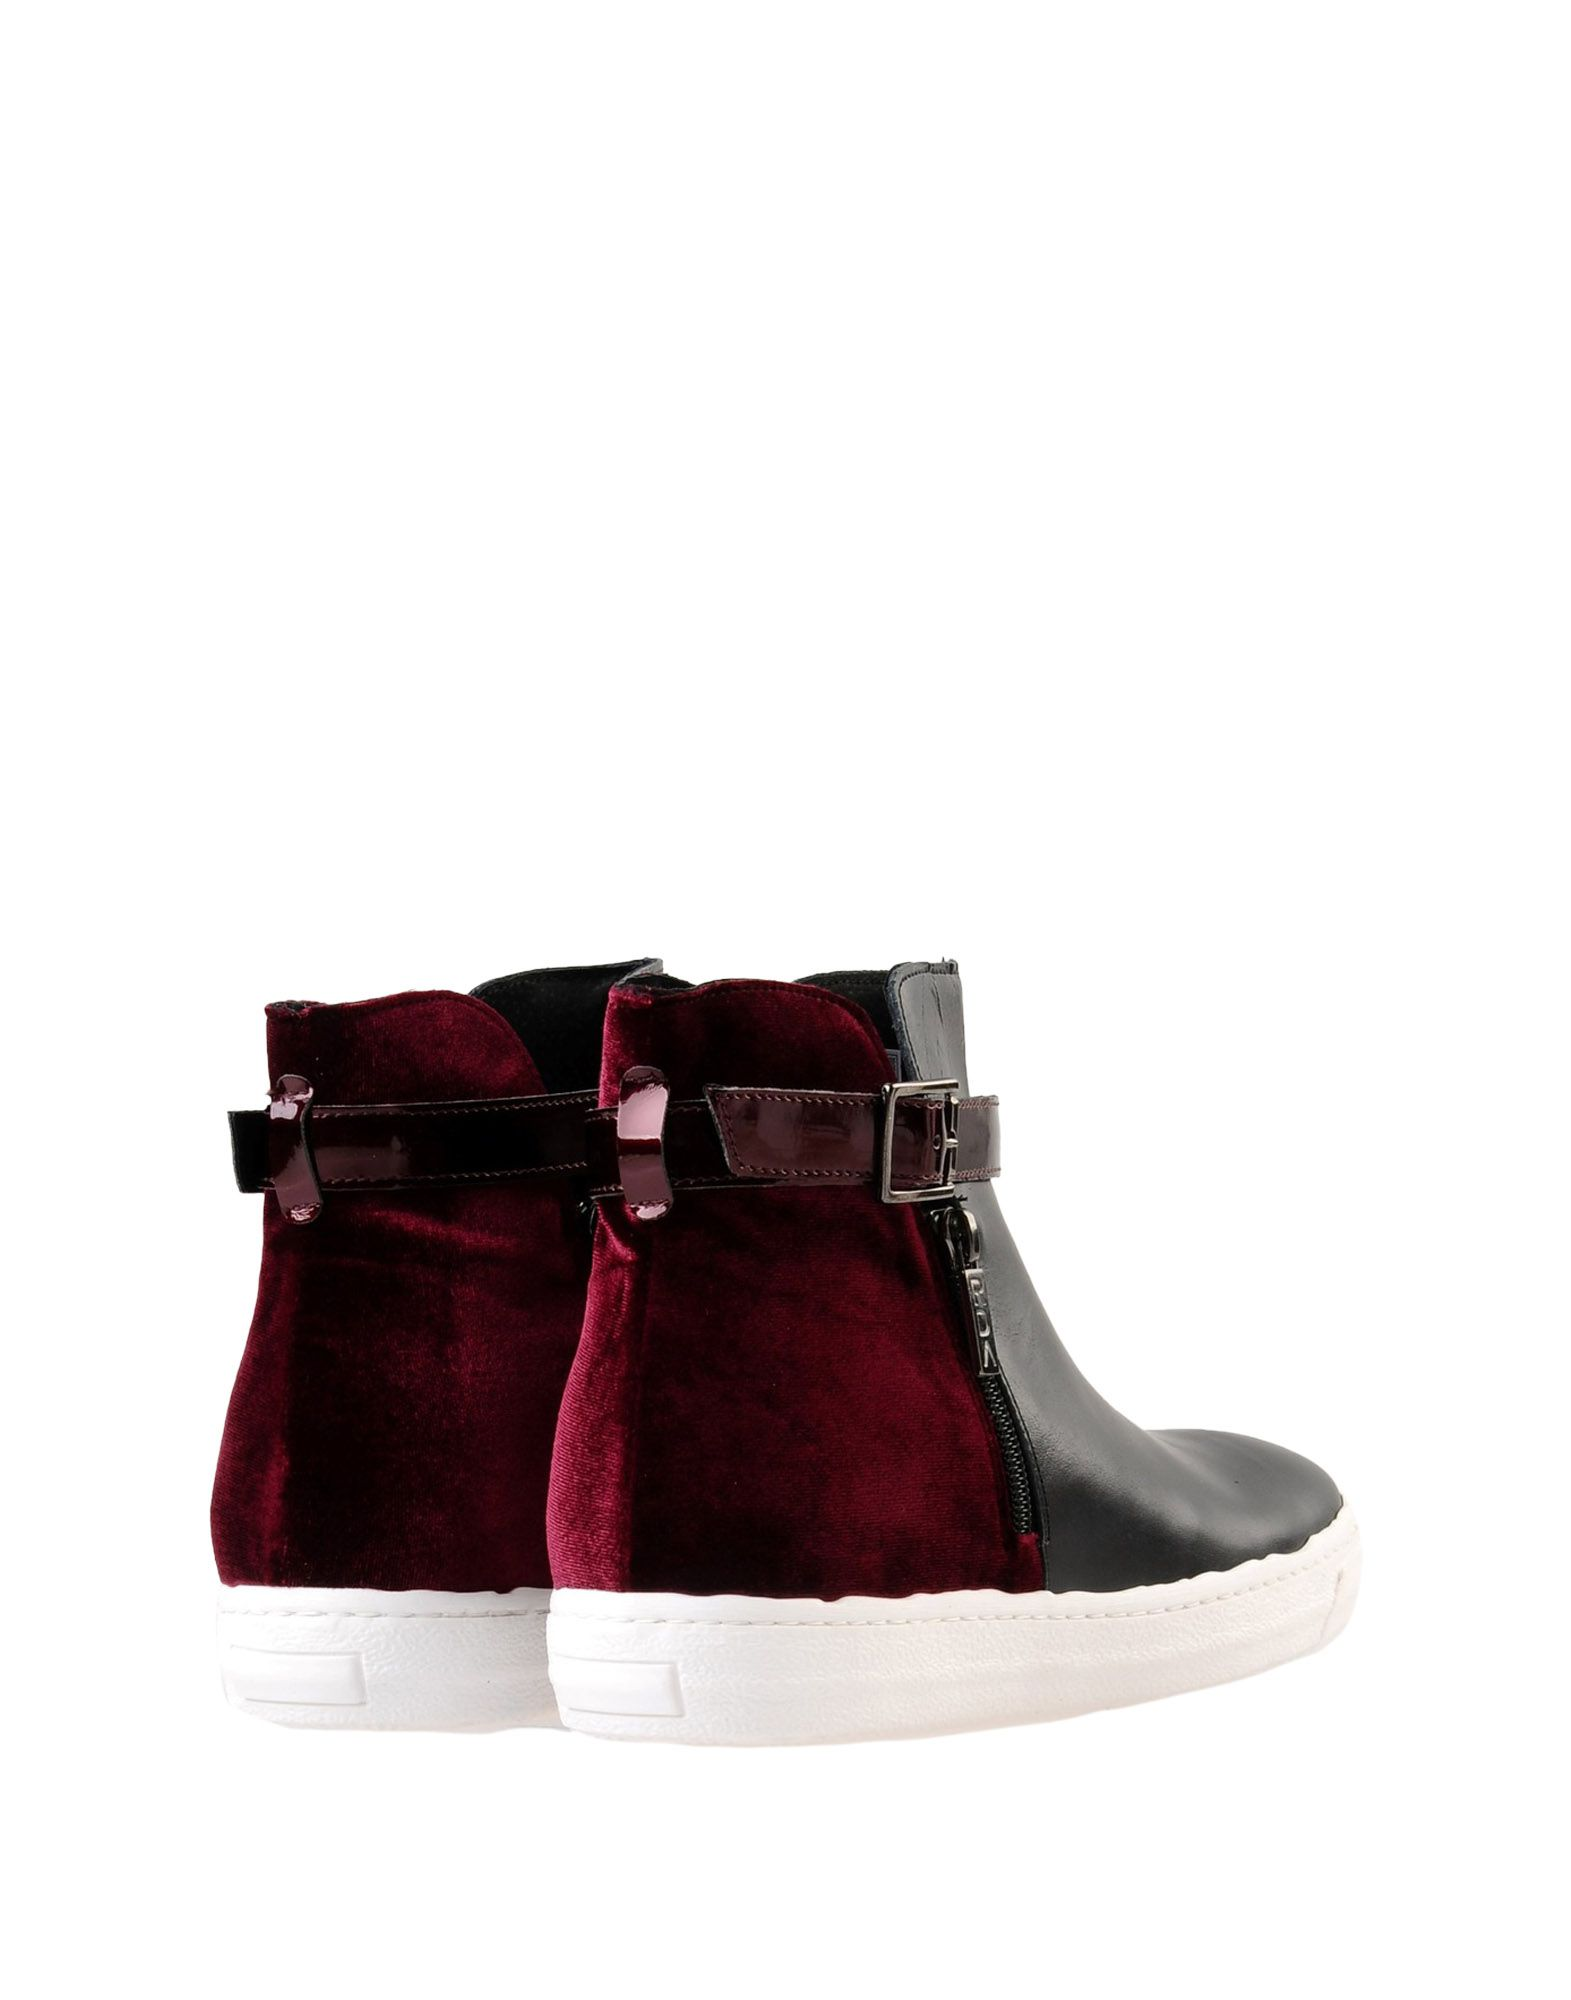 Jolie By Damen Edward Spiers Sneakers Damen By  11540251TC Gute Qualität beliebte Schuhe 277666